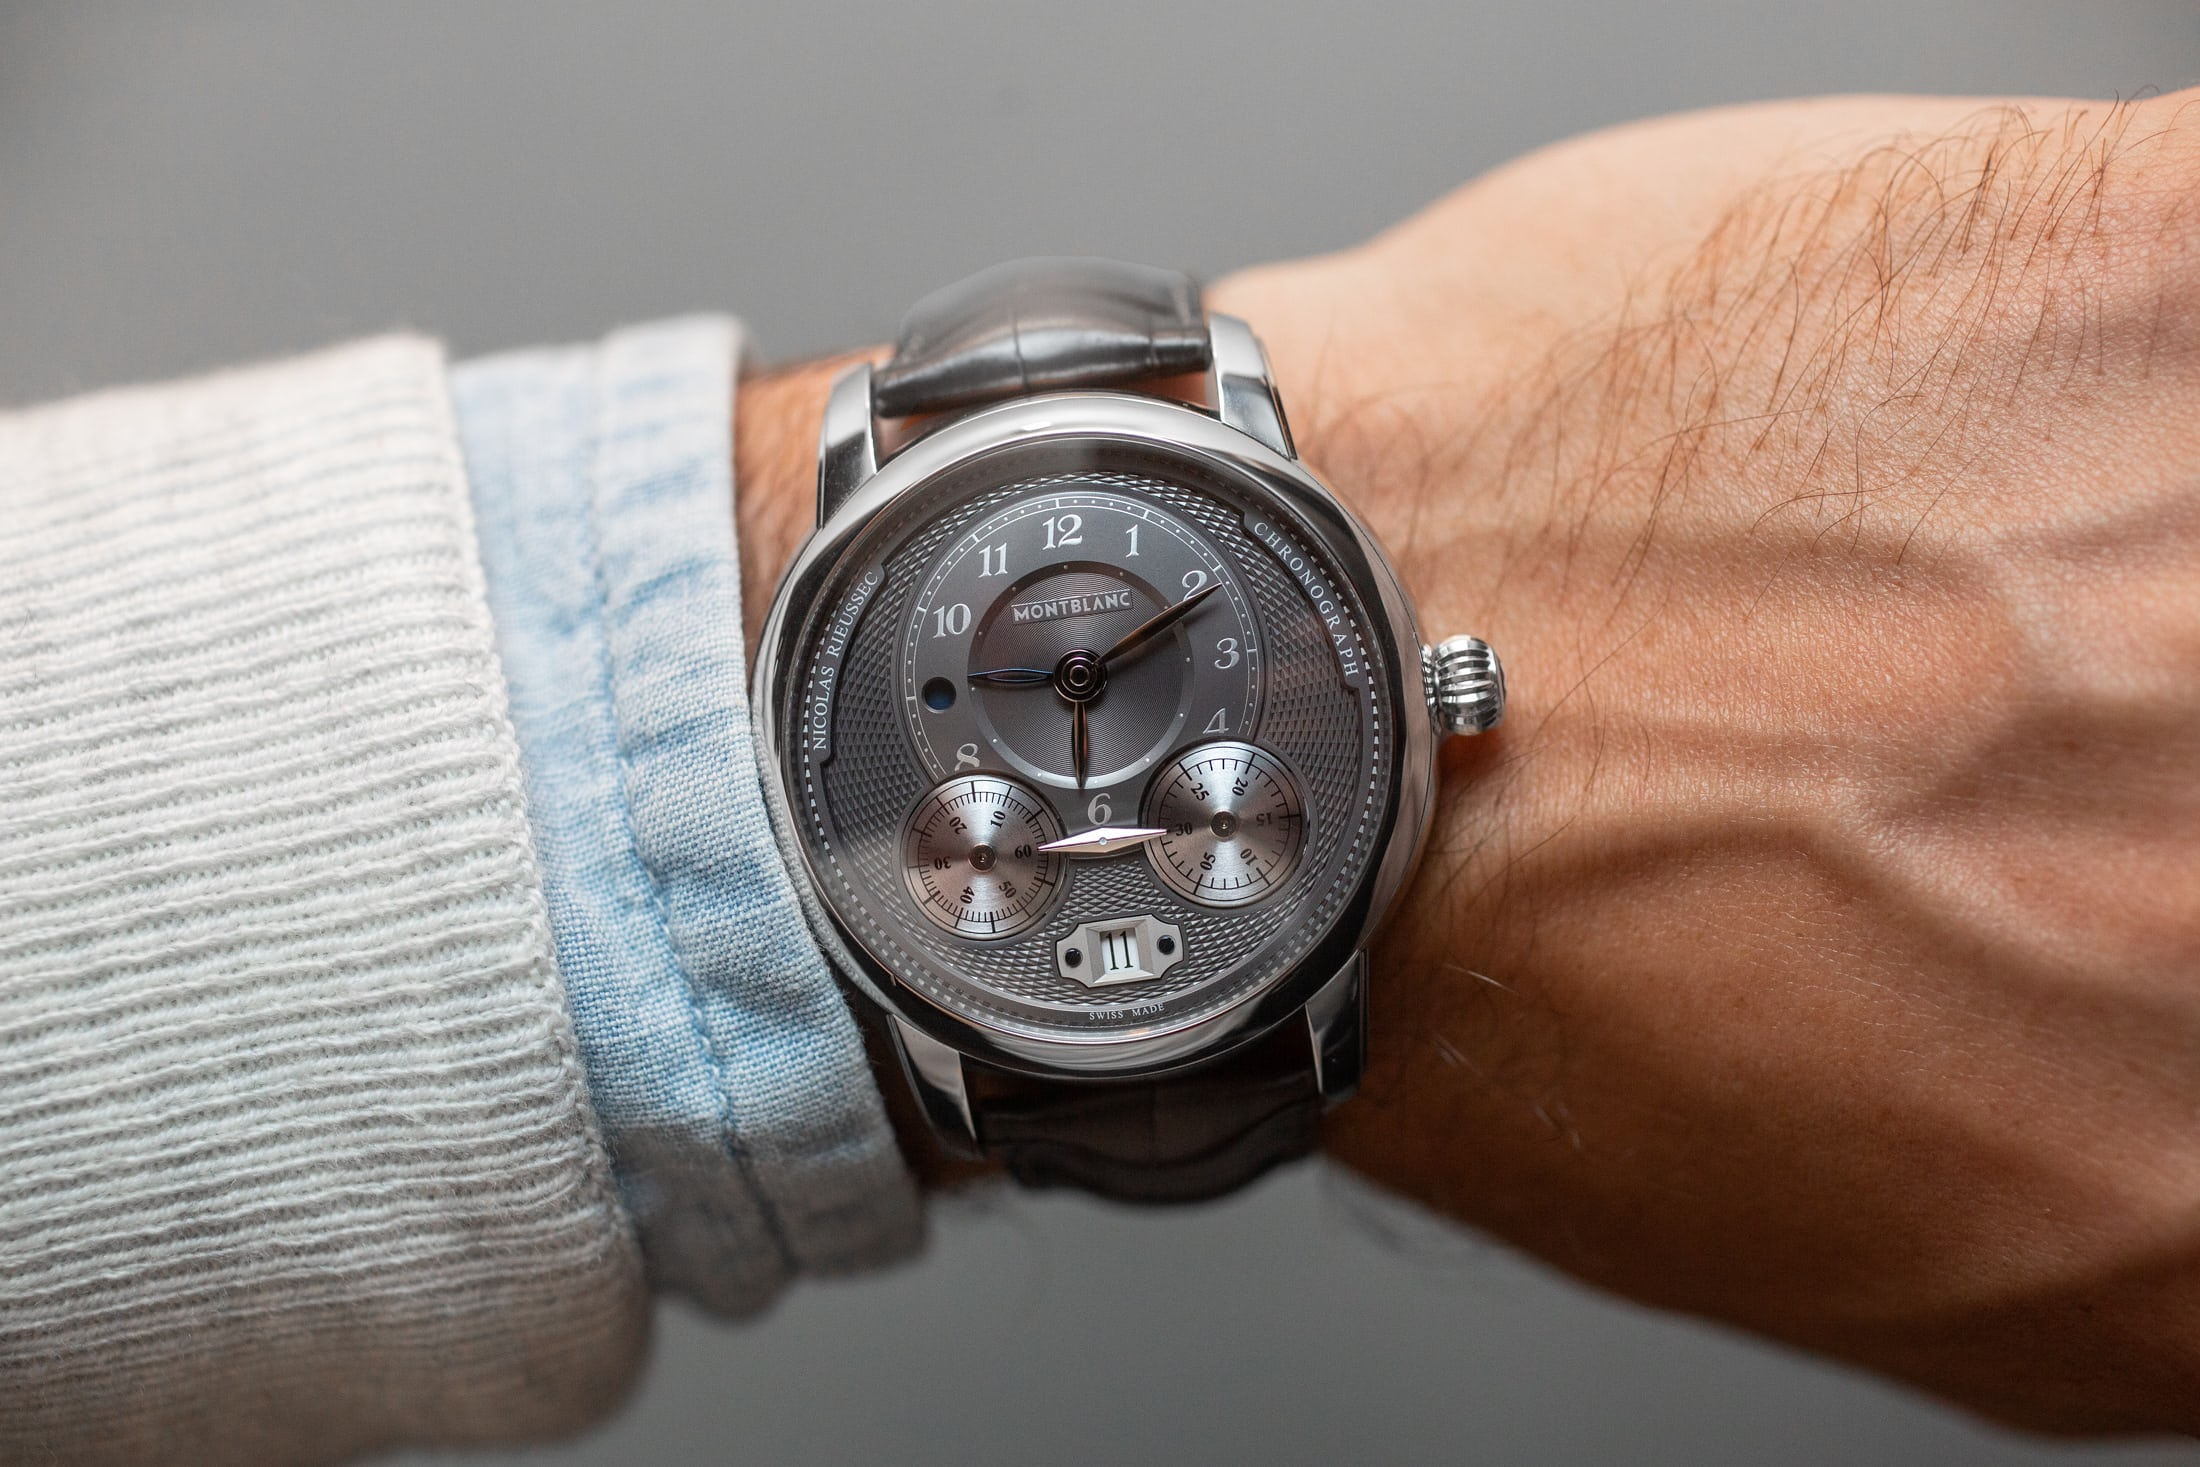 montblanc-star-legacy-nicolas-rieussec-chronograph-anthracite-on-wrist